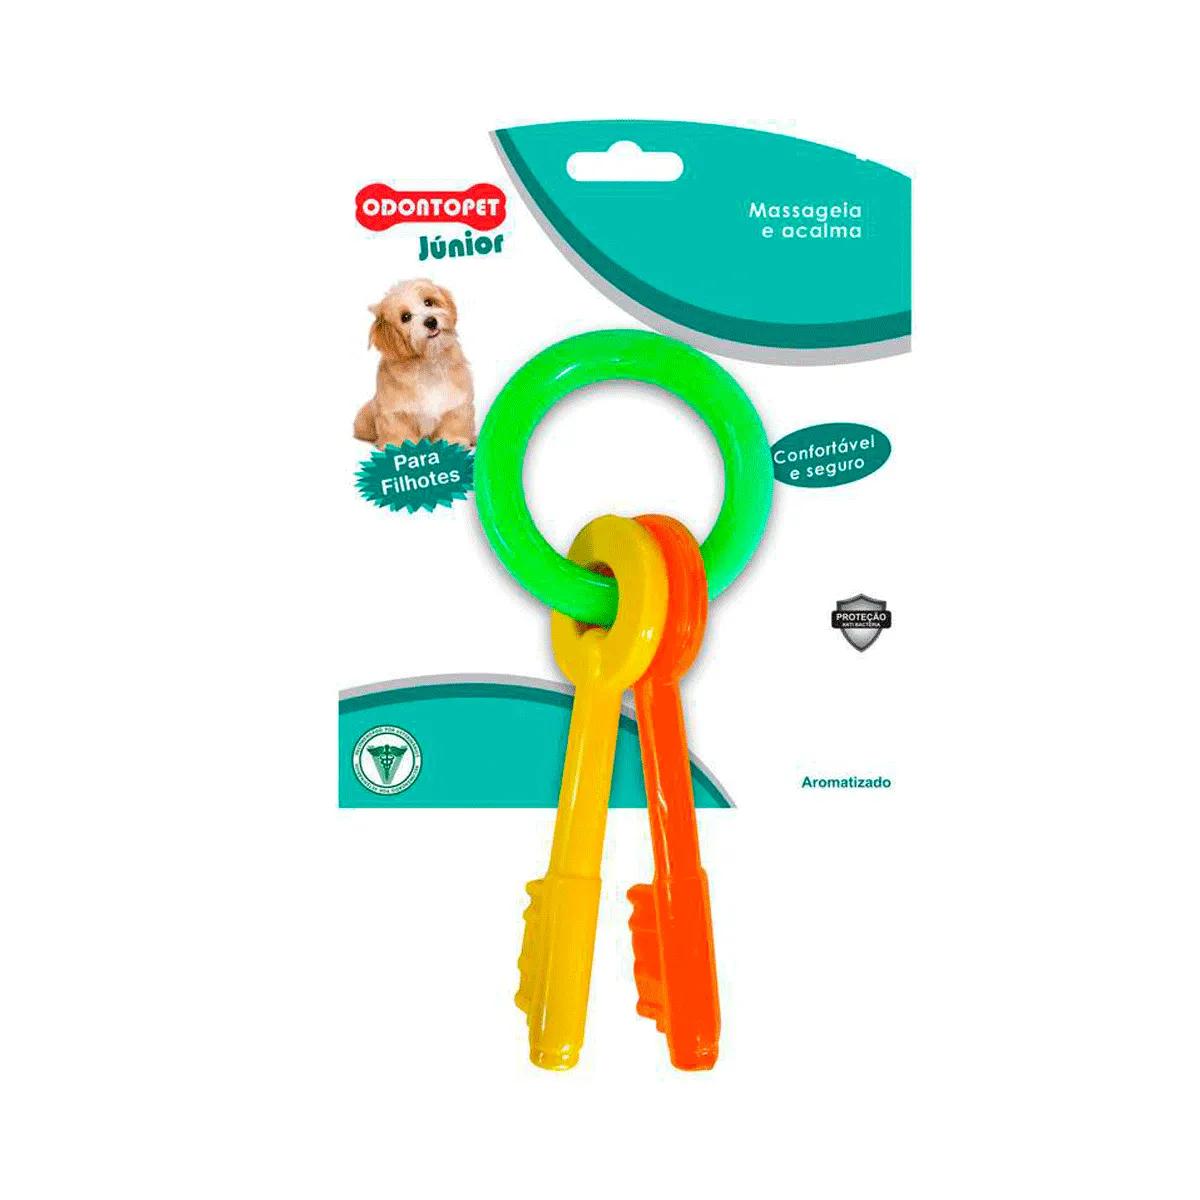 Brinquedo para Cachorro Filhote Chaves Odontopet